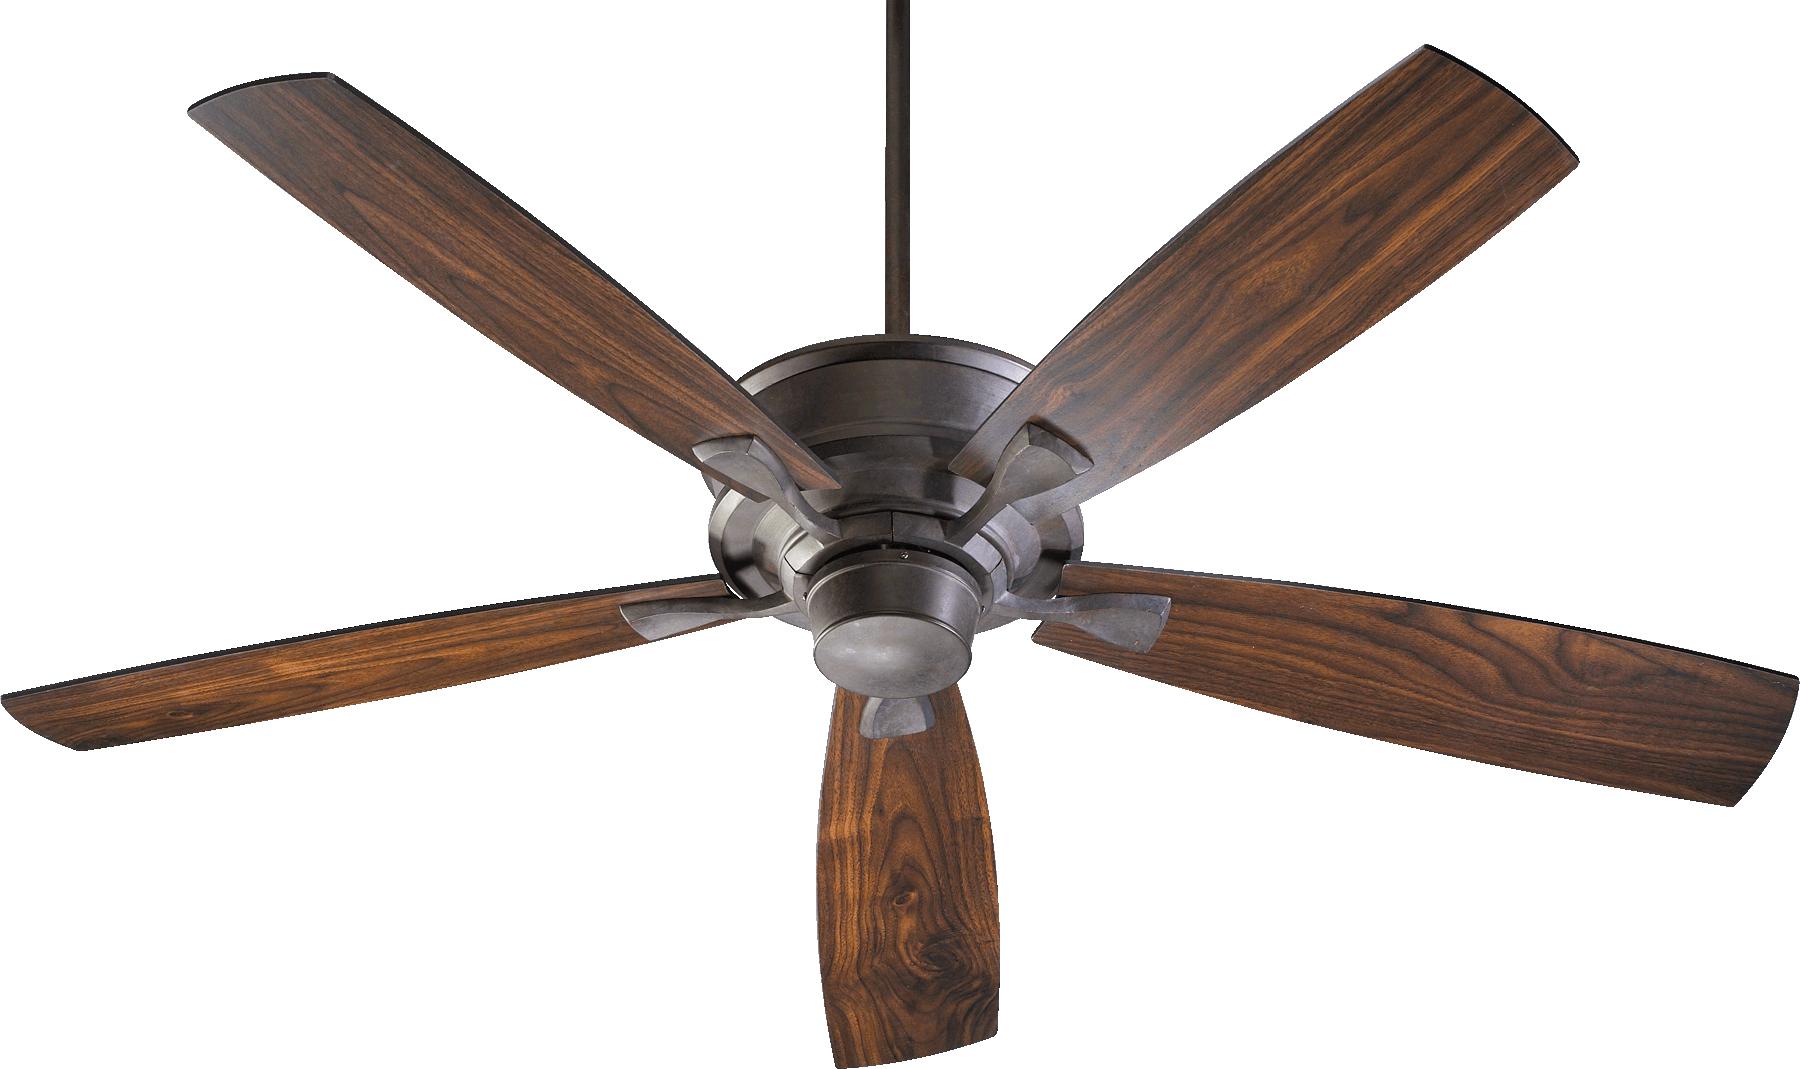 "Quorum Alton 60"" Toasted Sienna Ceiling Fan (42605-44)"